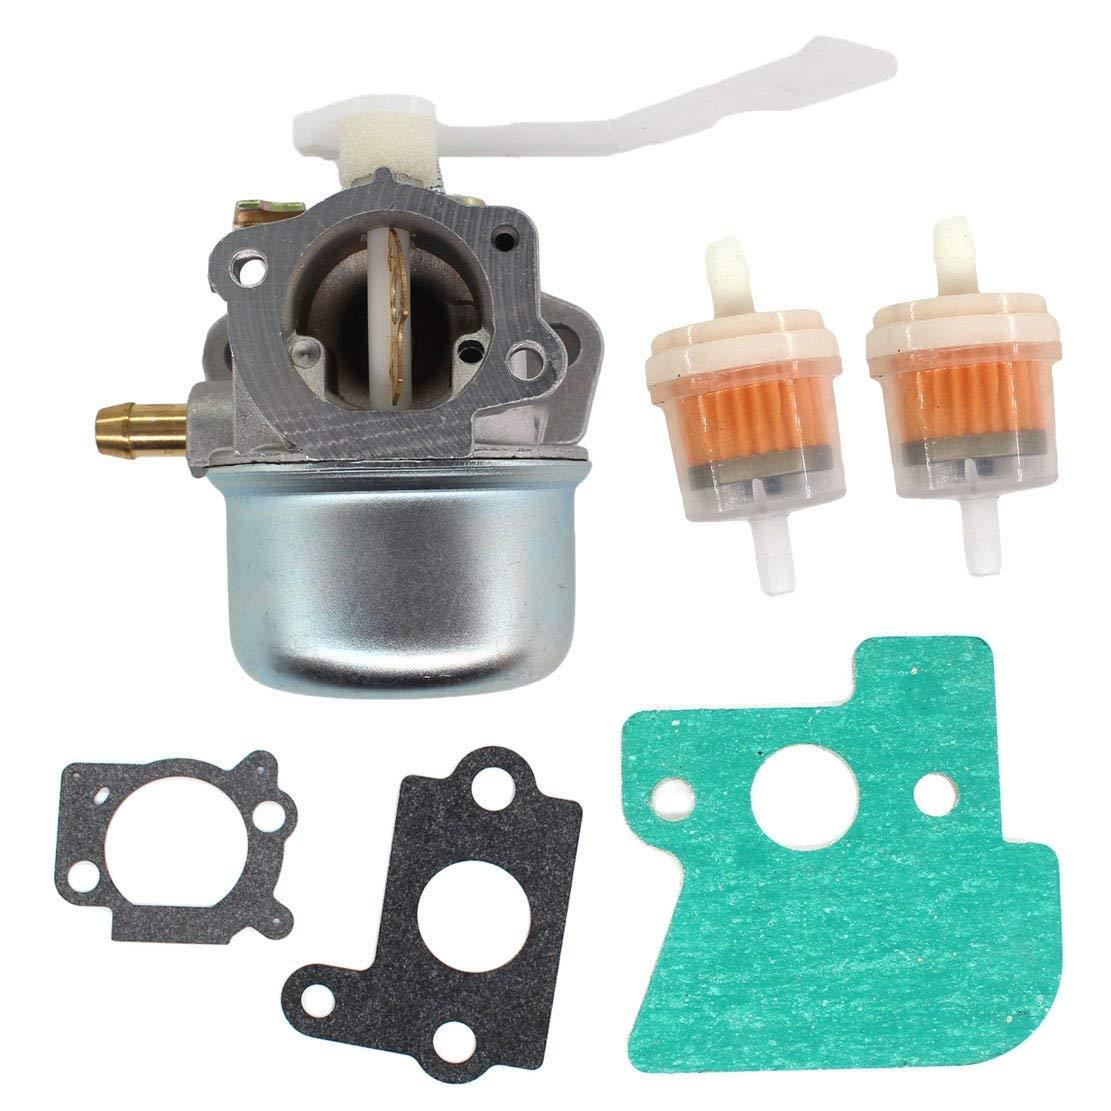 USPEEDA Carburetor for Briggs & Stratton 694203 690152 Small Engine Motor 121602 122602 121607 121612